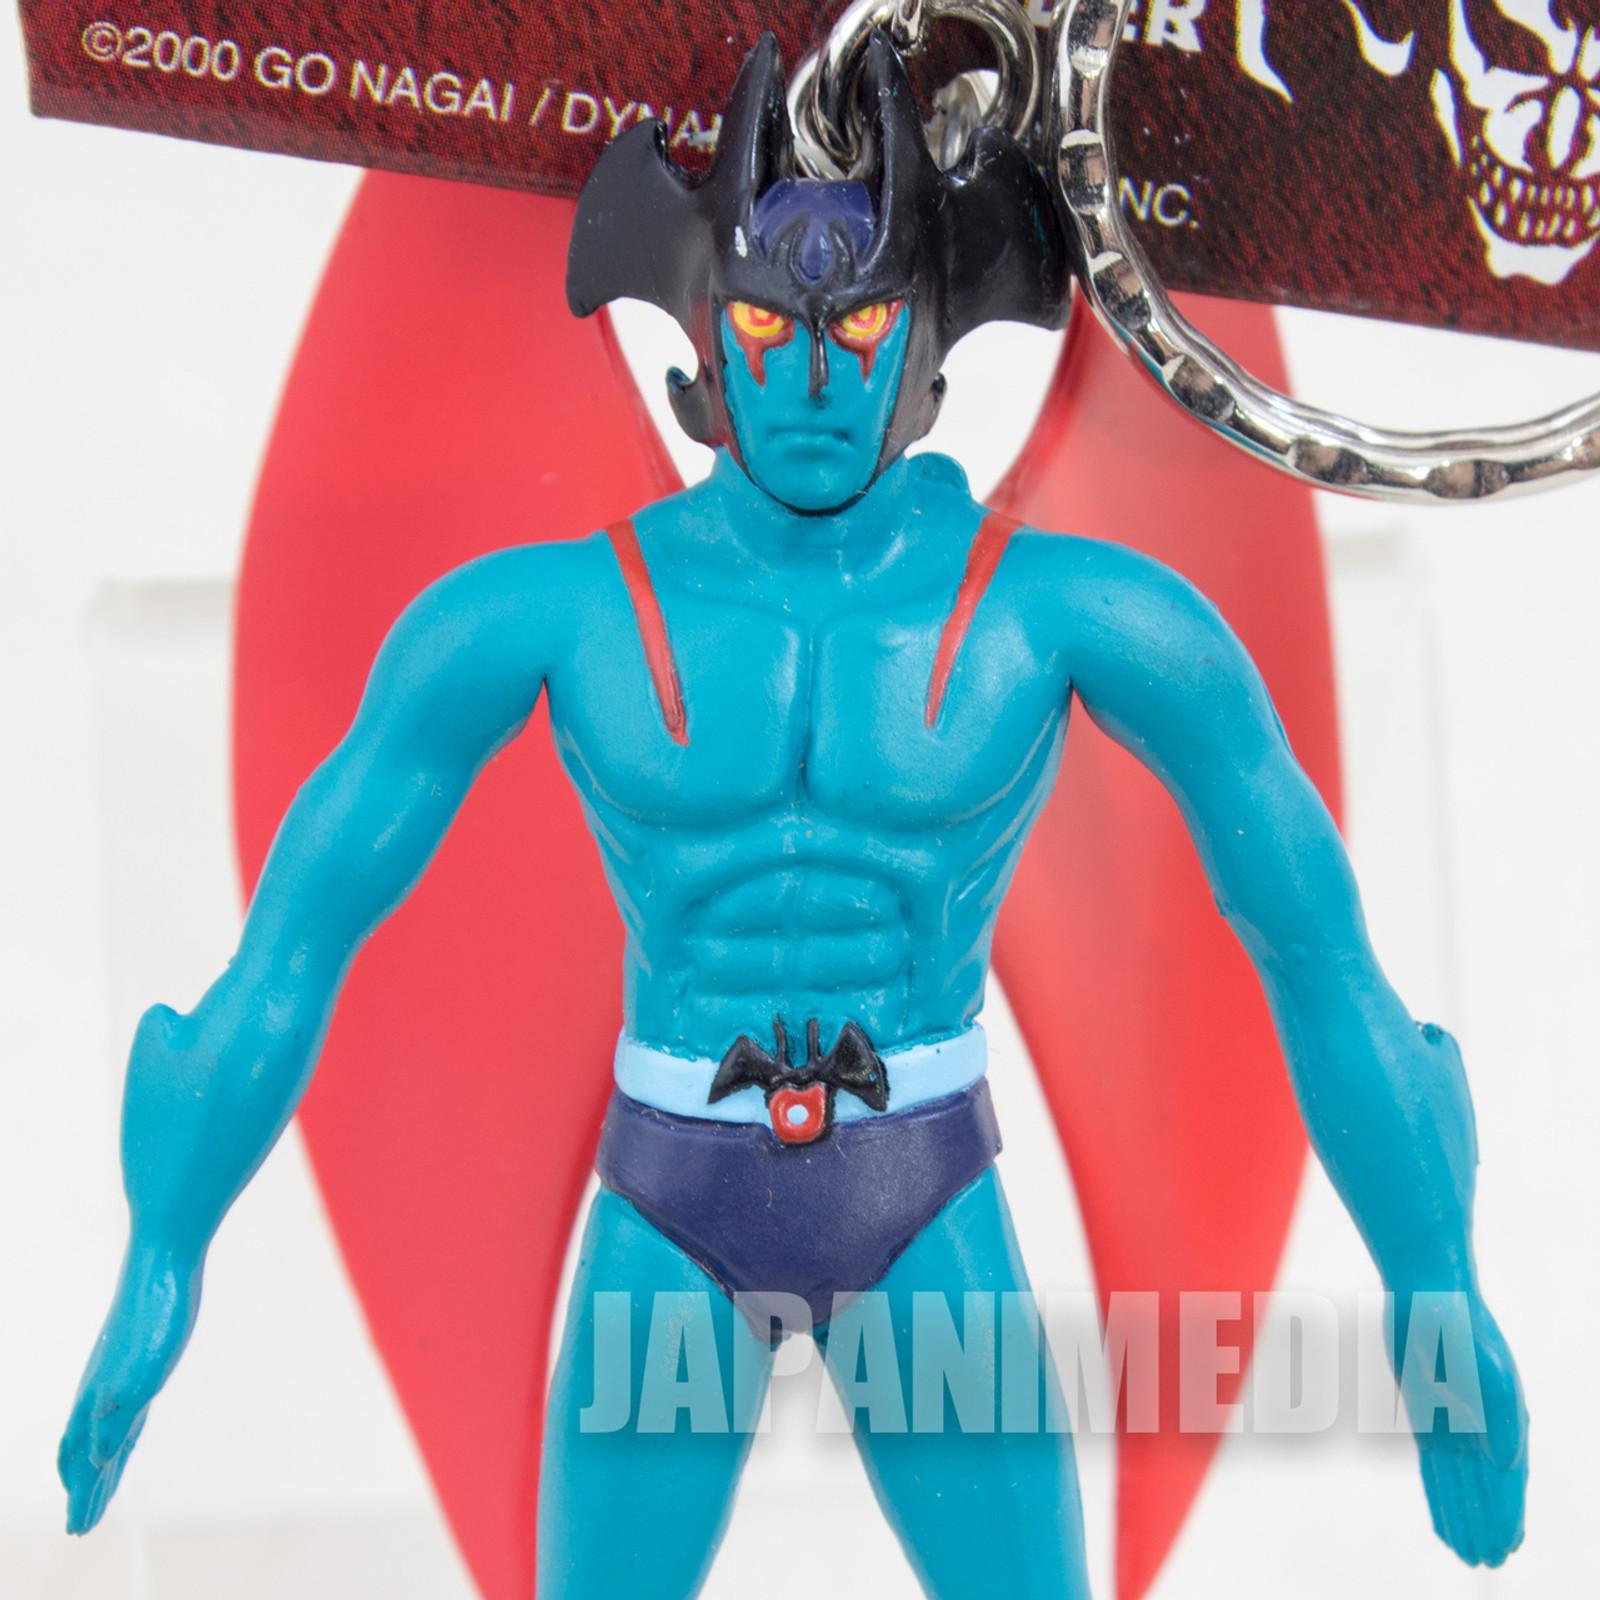 Devilman Anime Ver. Figure Key Chain Banpresto JAPAN ANIME NAGAI GO 2